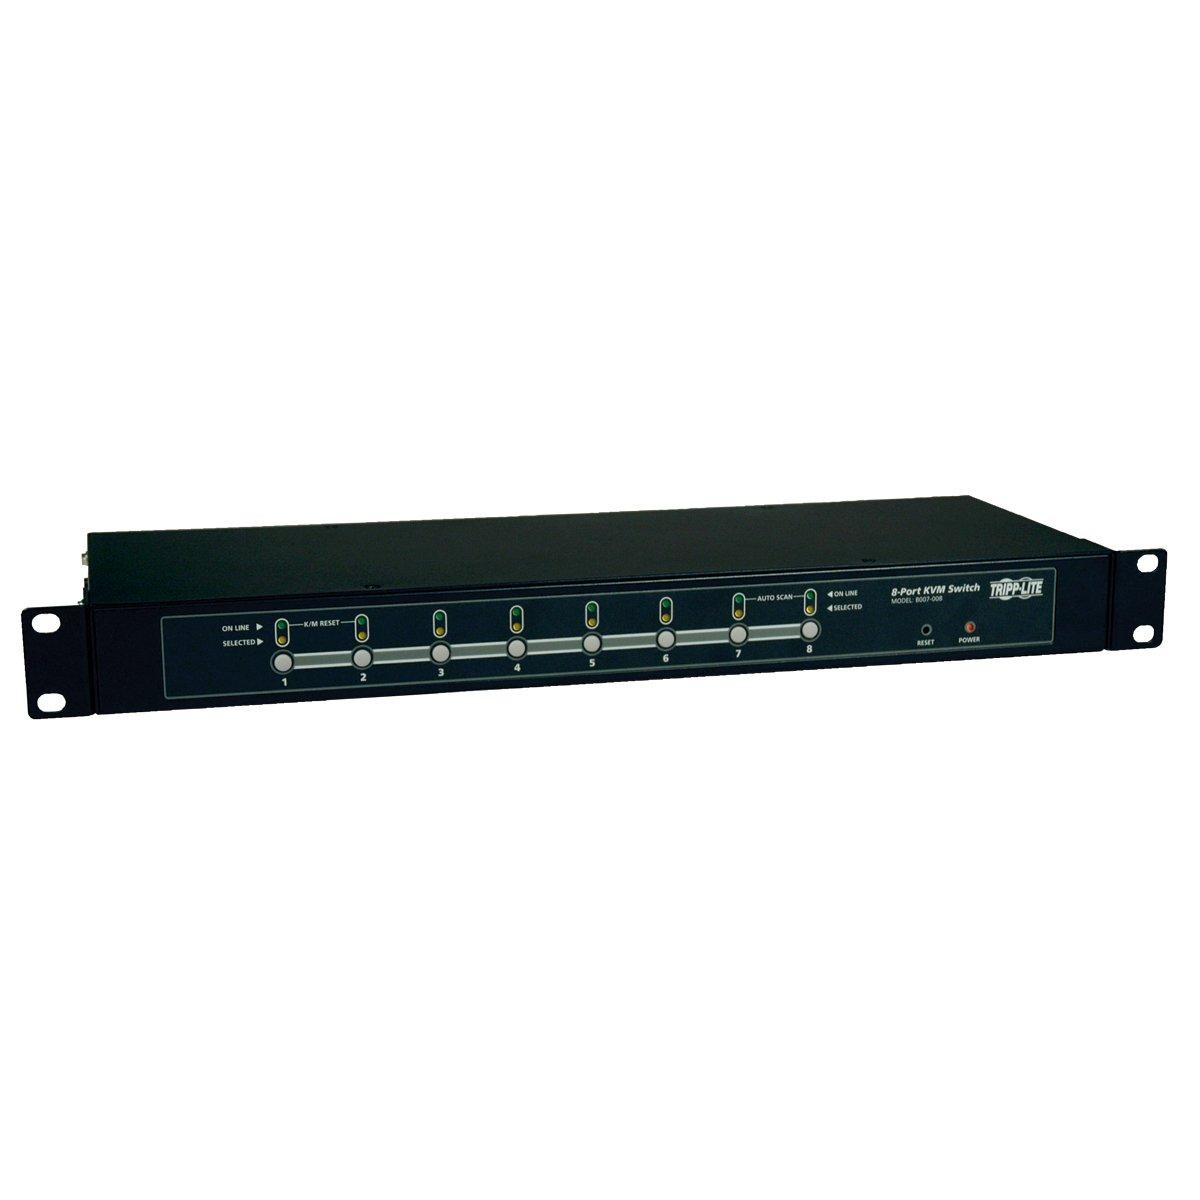 Tripp Lite B007-008 8-Port 1U Rackmount KVM Switch with On-Screen Display